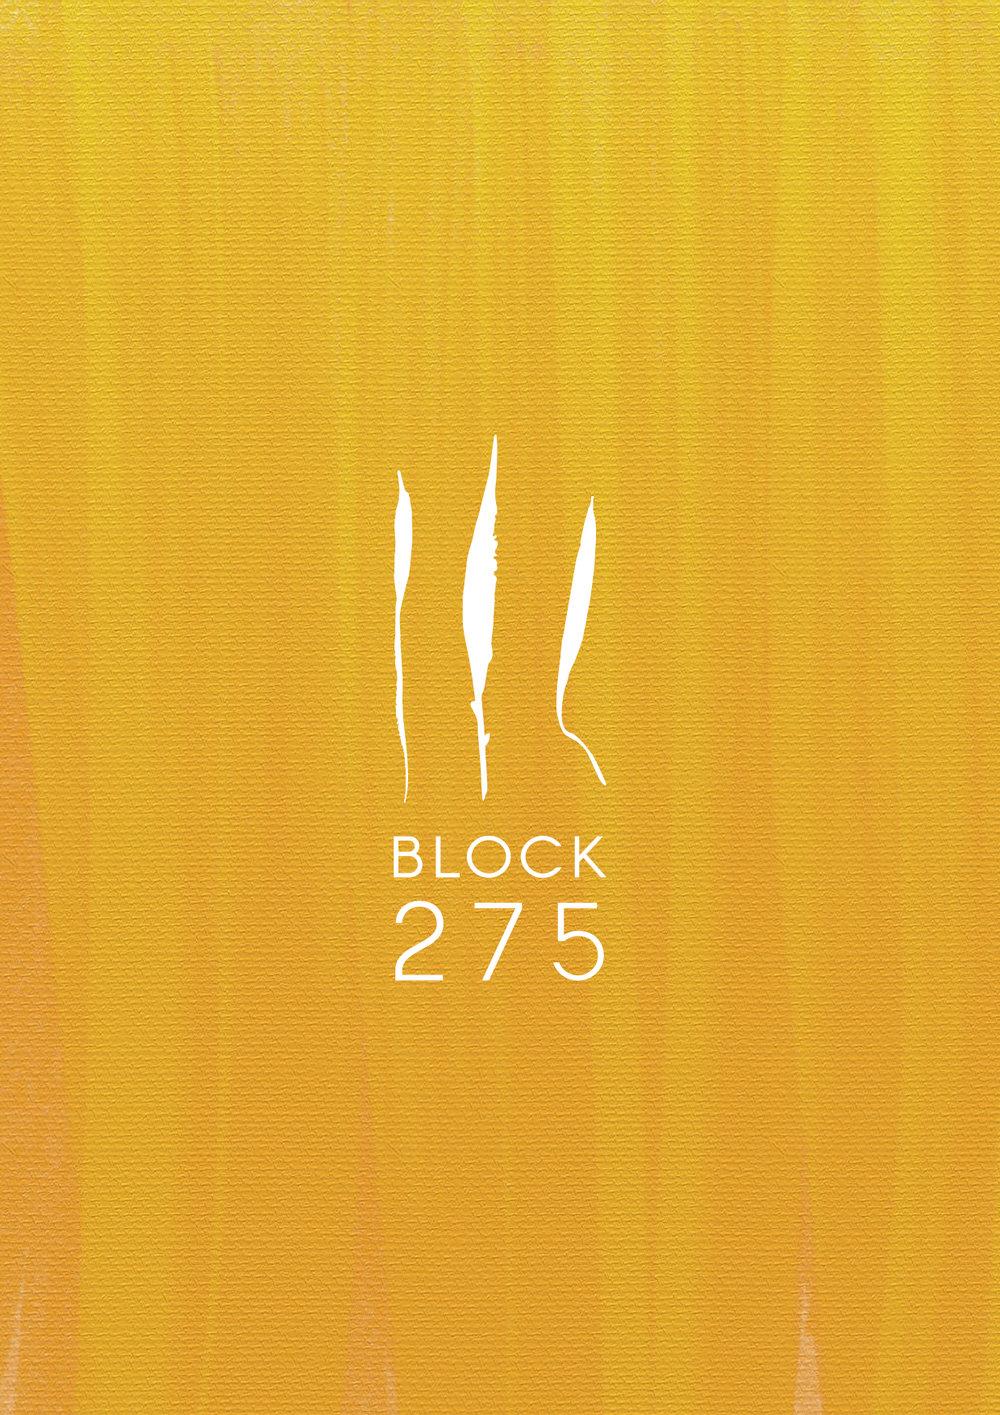 Block 275_Logo Concept 3 - 4.jpg